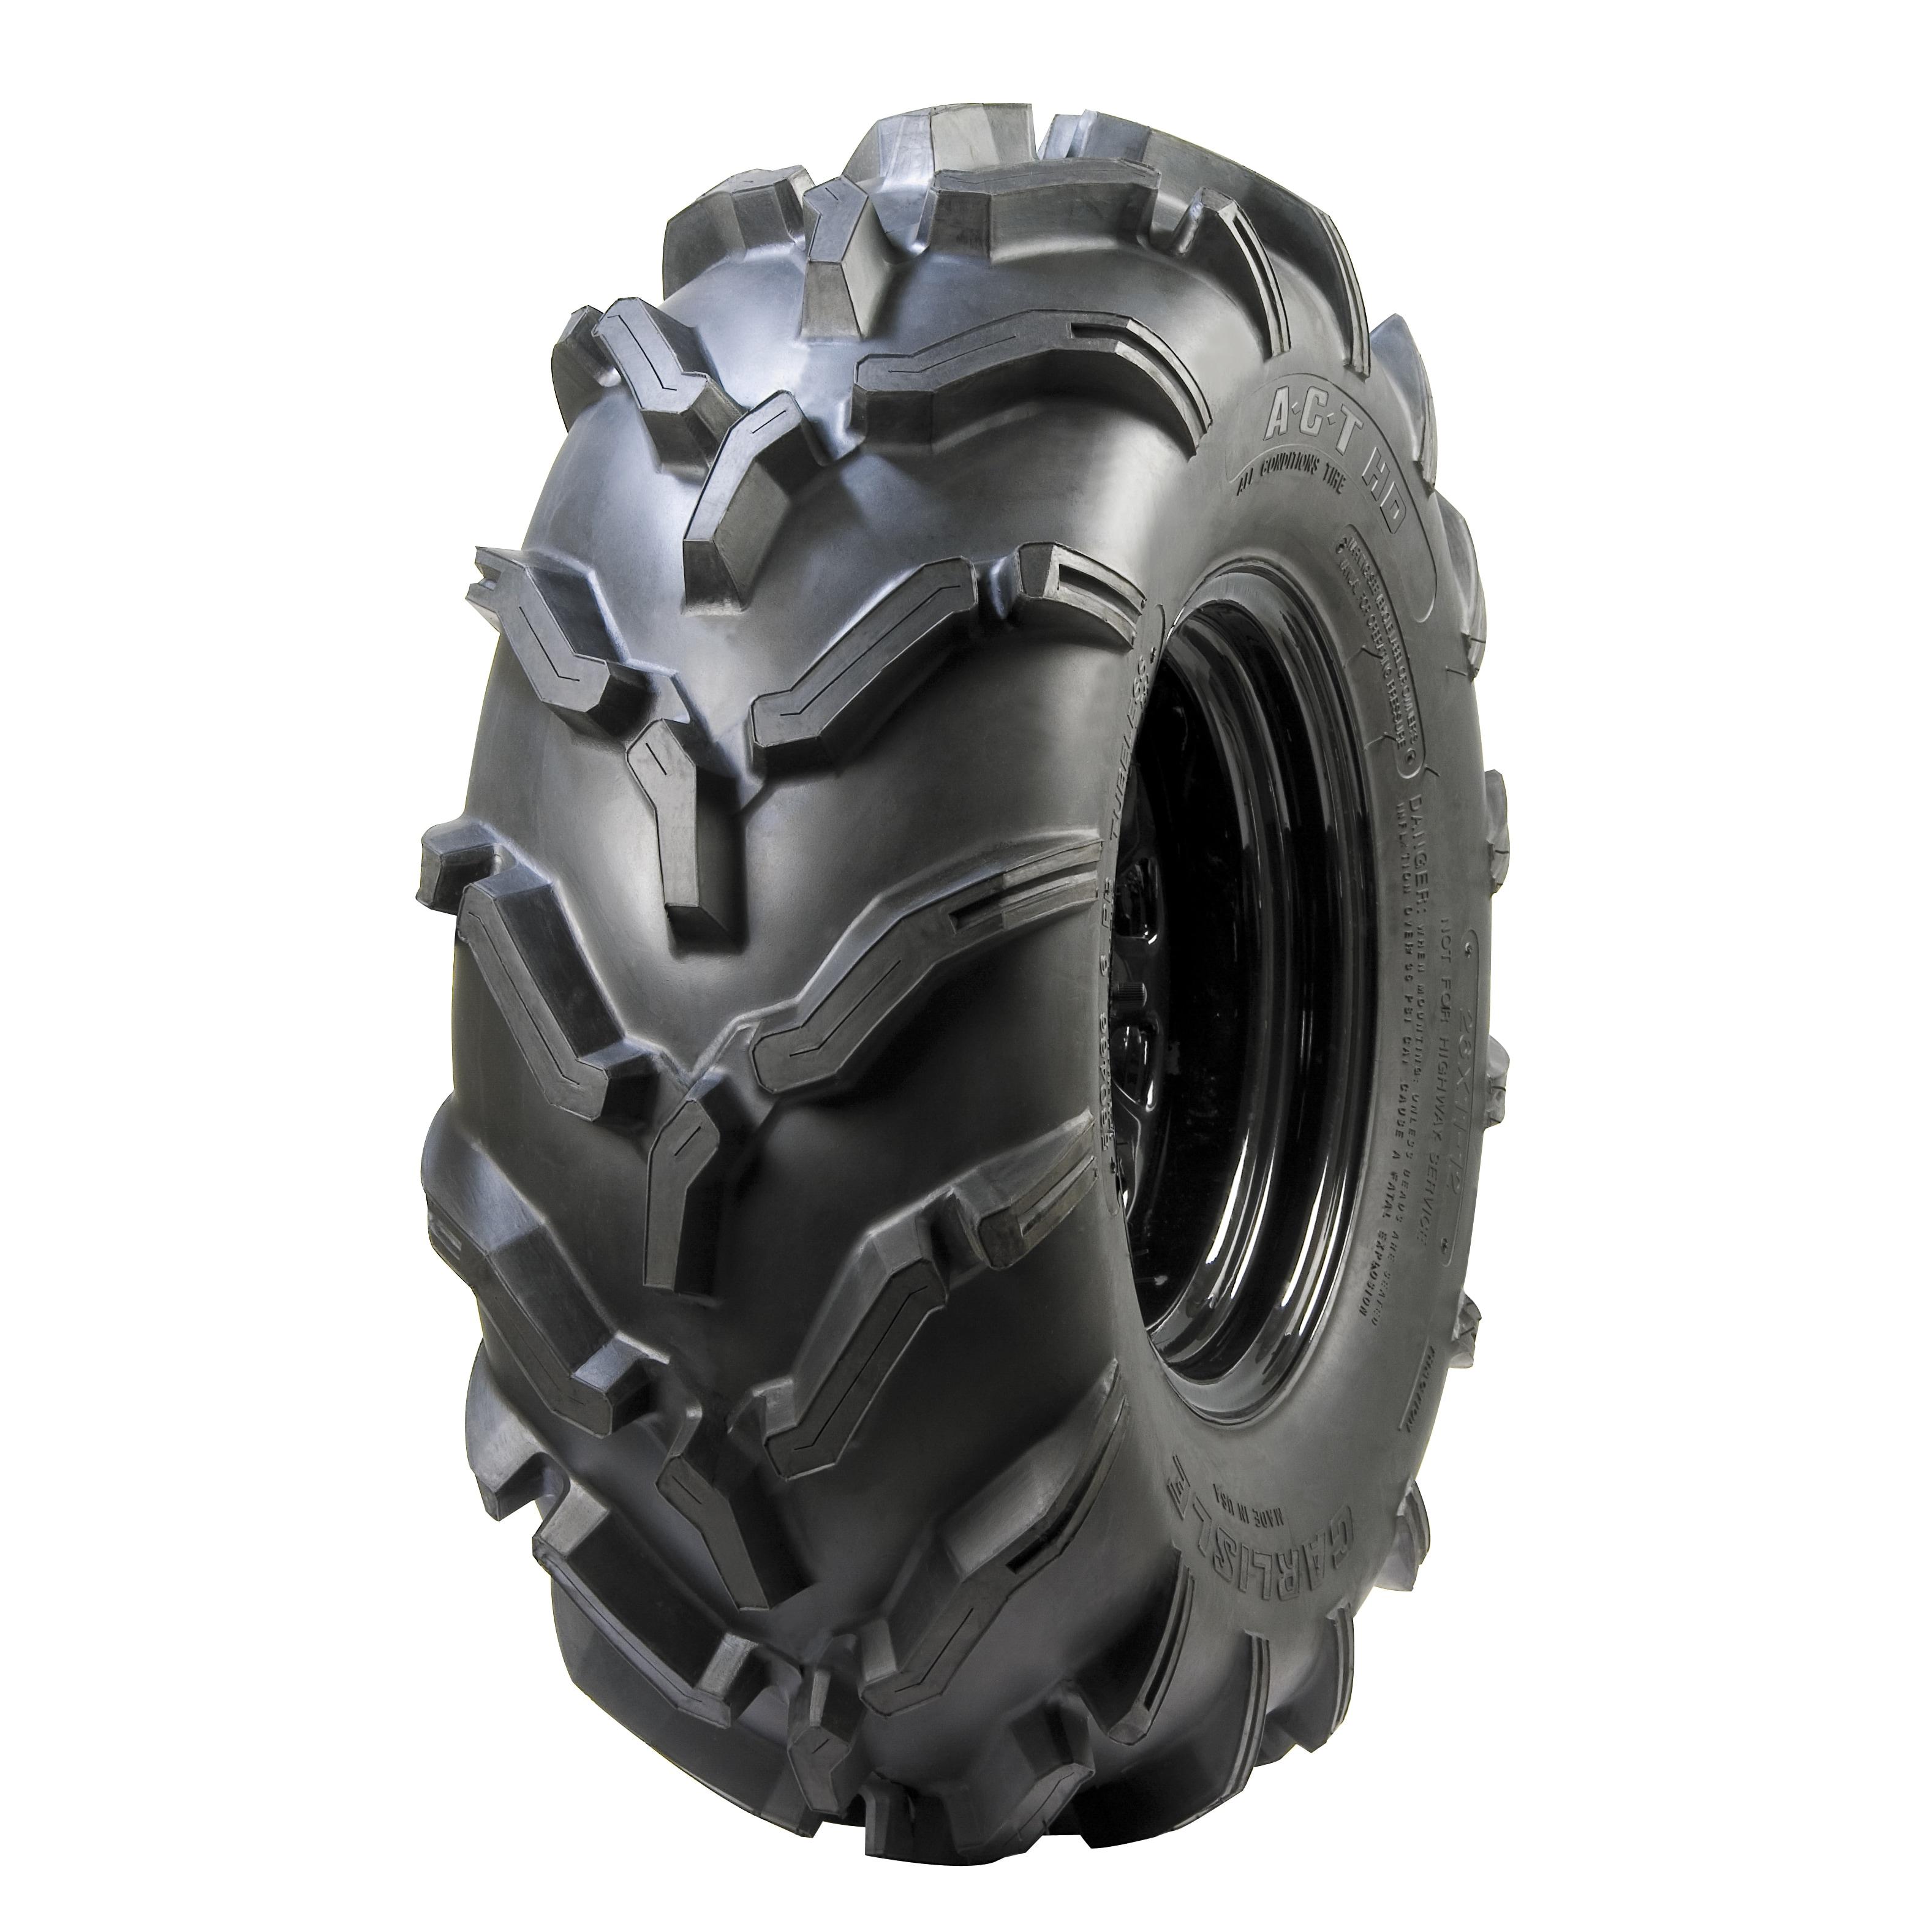 Carlisle A.C.T. HD ATV Tire - 25X800R12 LRC/6 ply (Black)